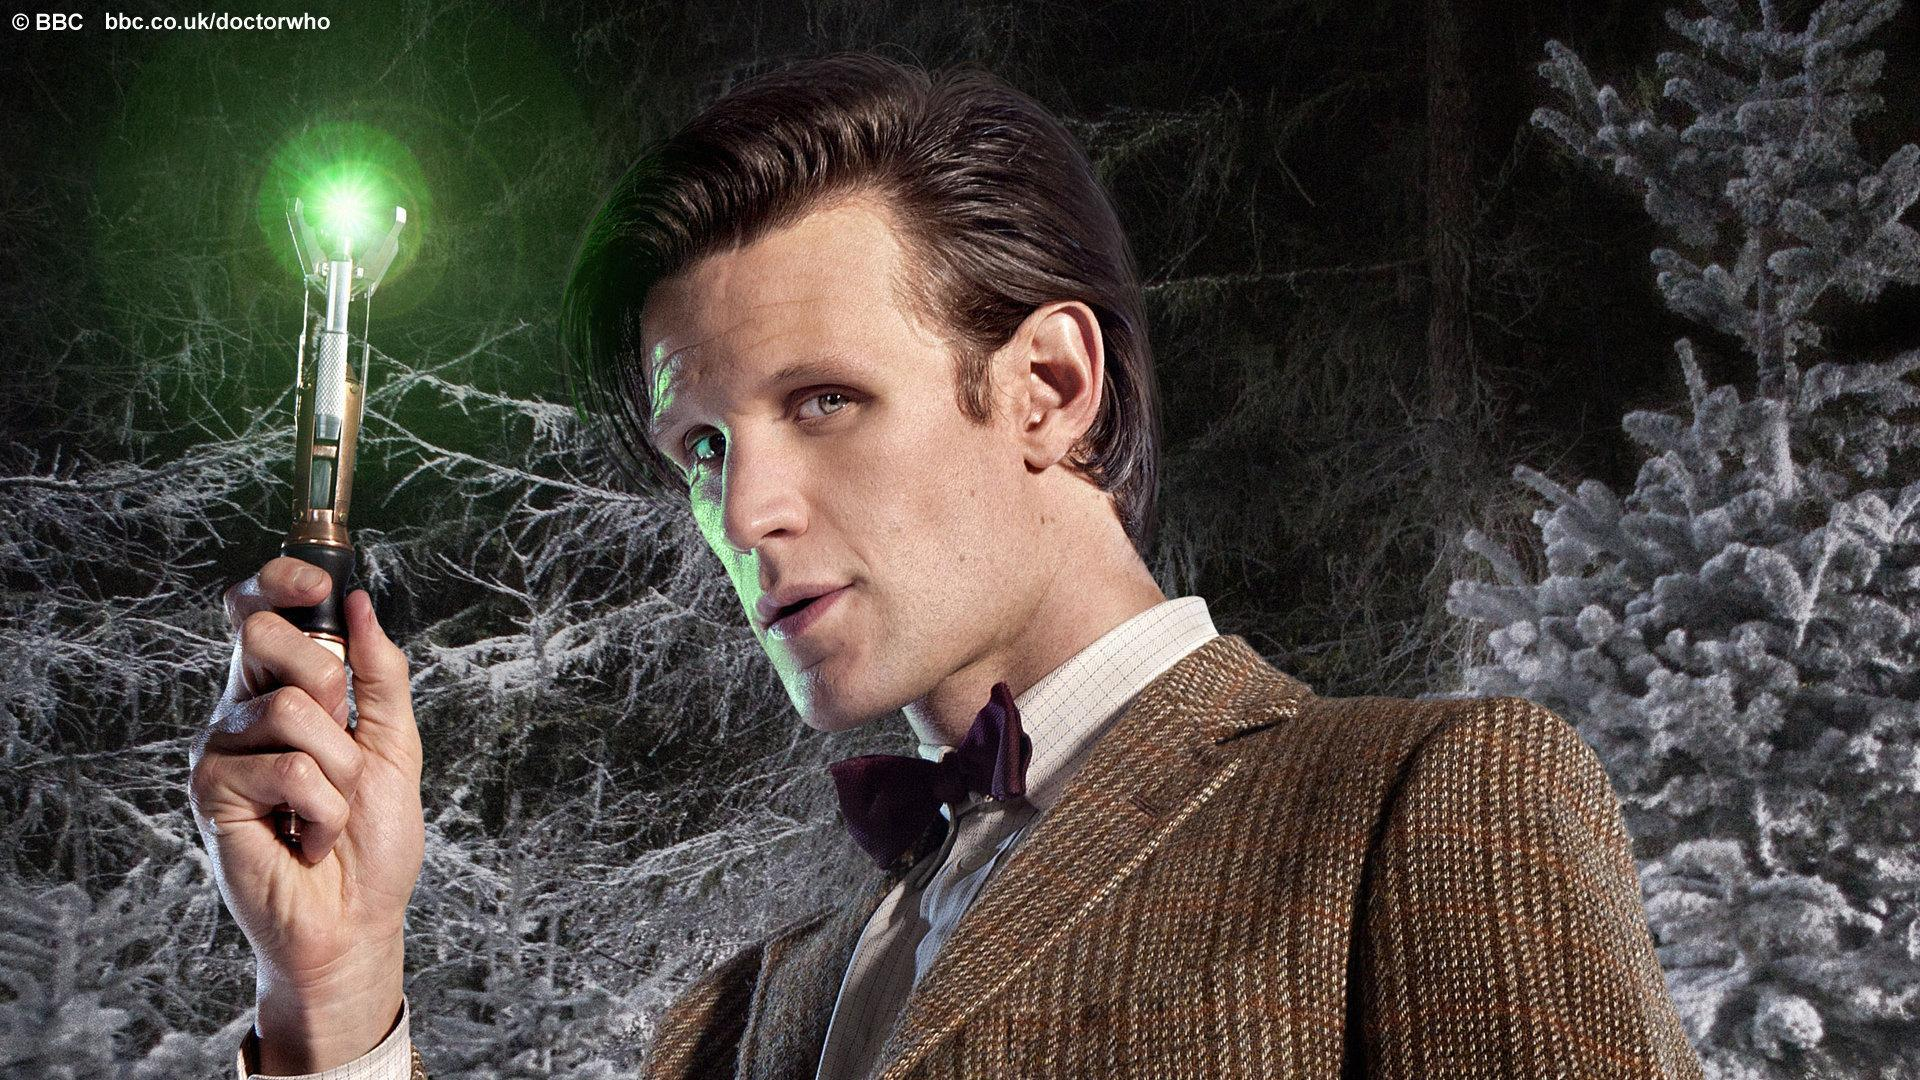 Doctor Who Wallpapers Matt Smith 1920x1080